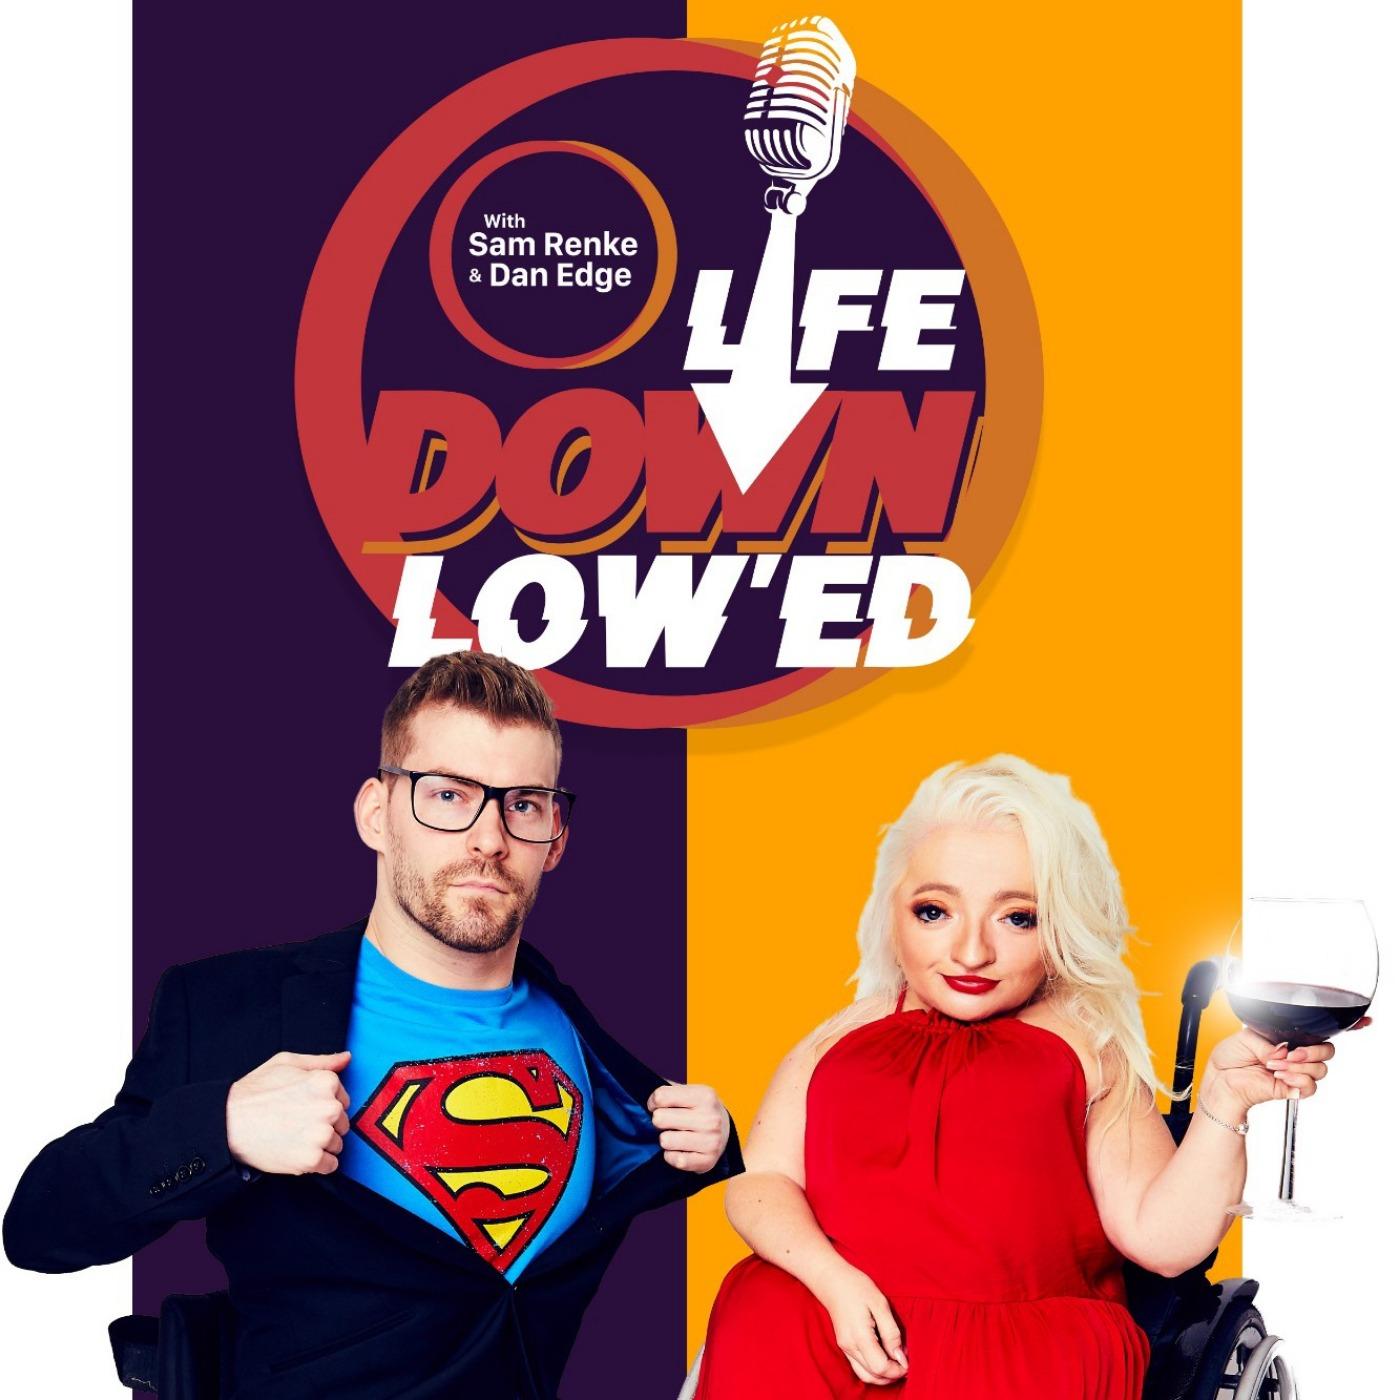 Life DownLow'ed